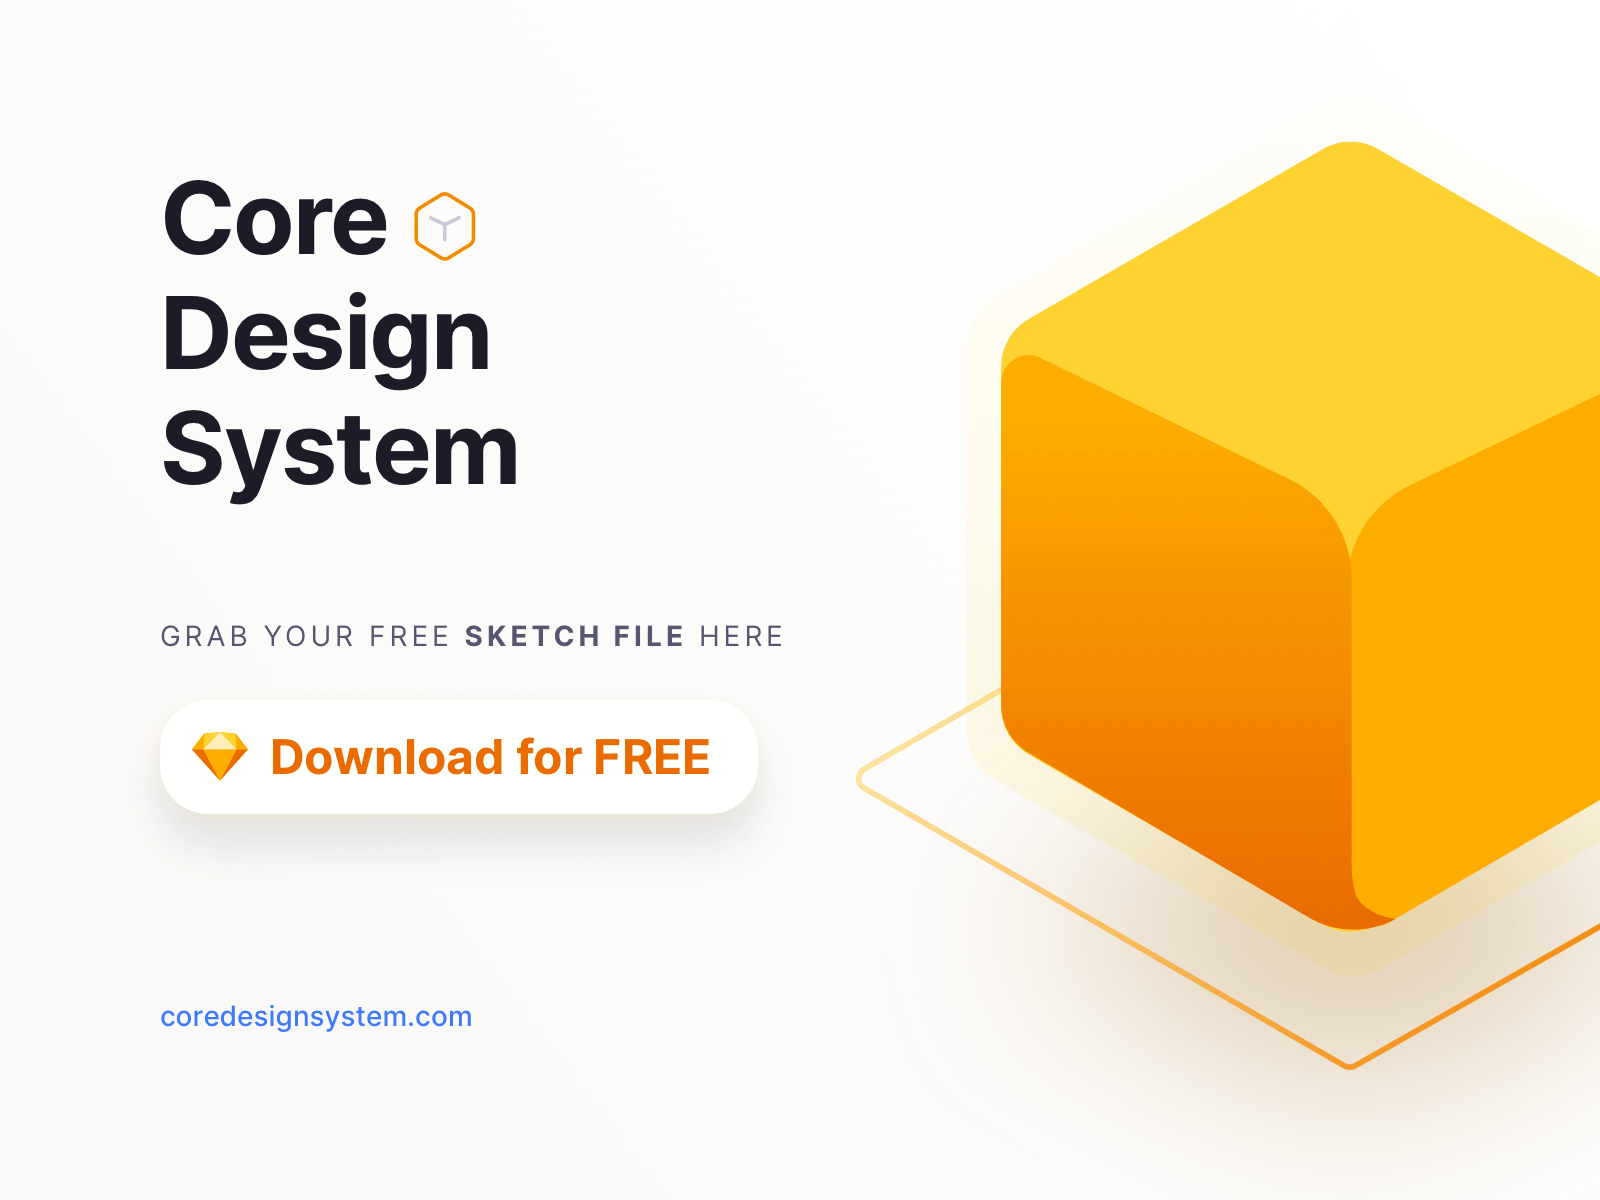 Core Design System thumbnail graphic